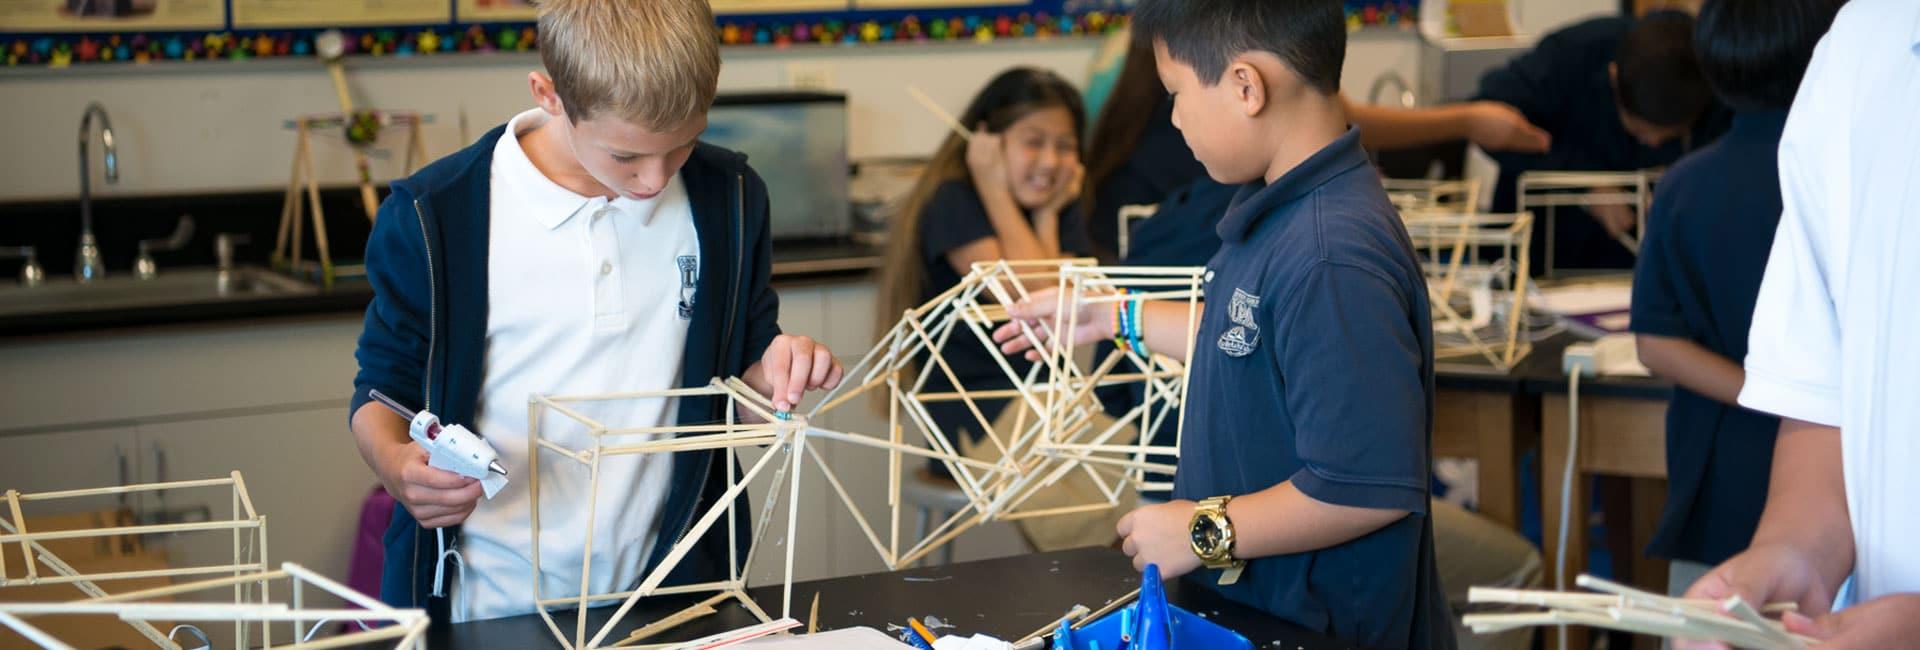 Grade 5 students building models in engineering